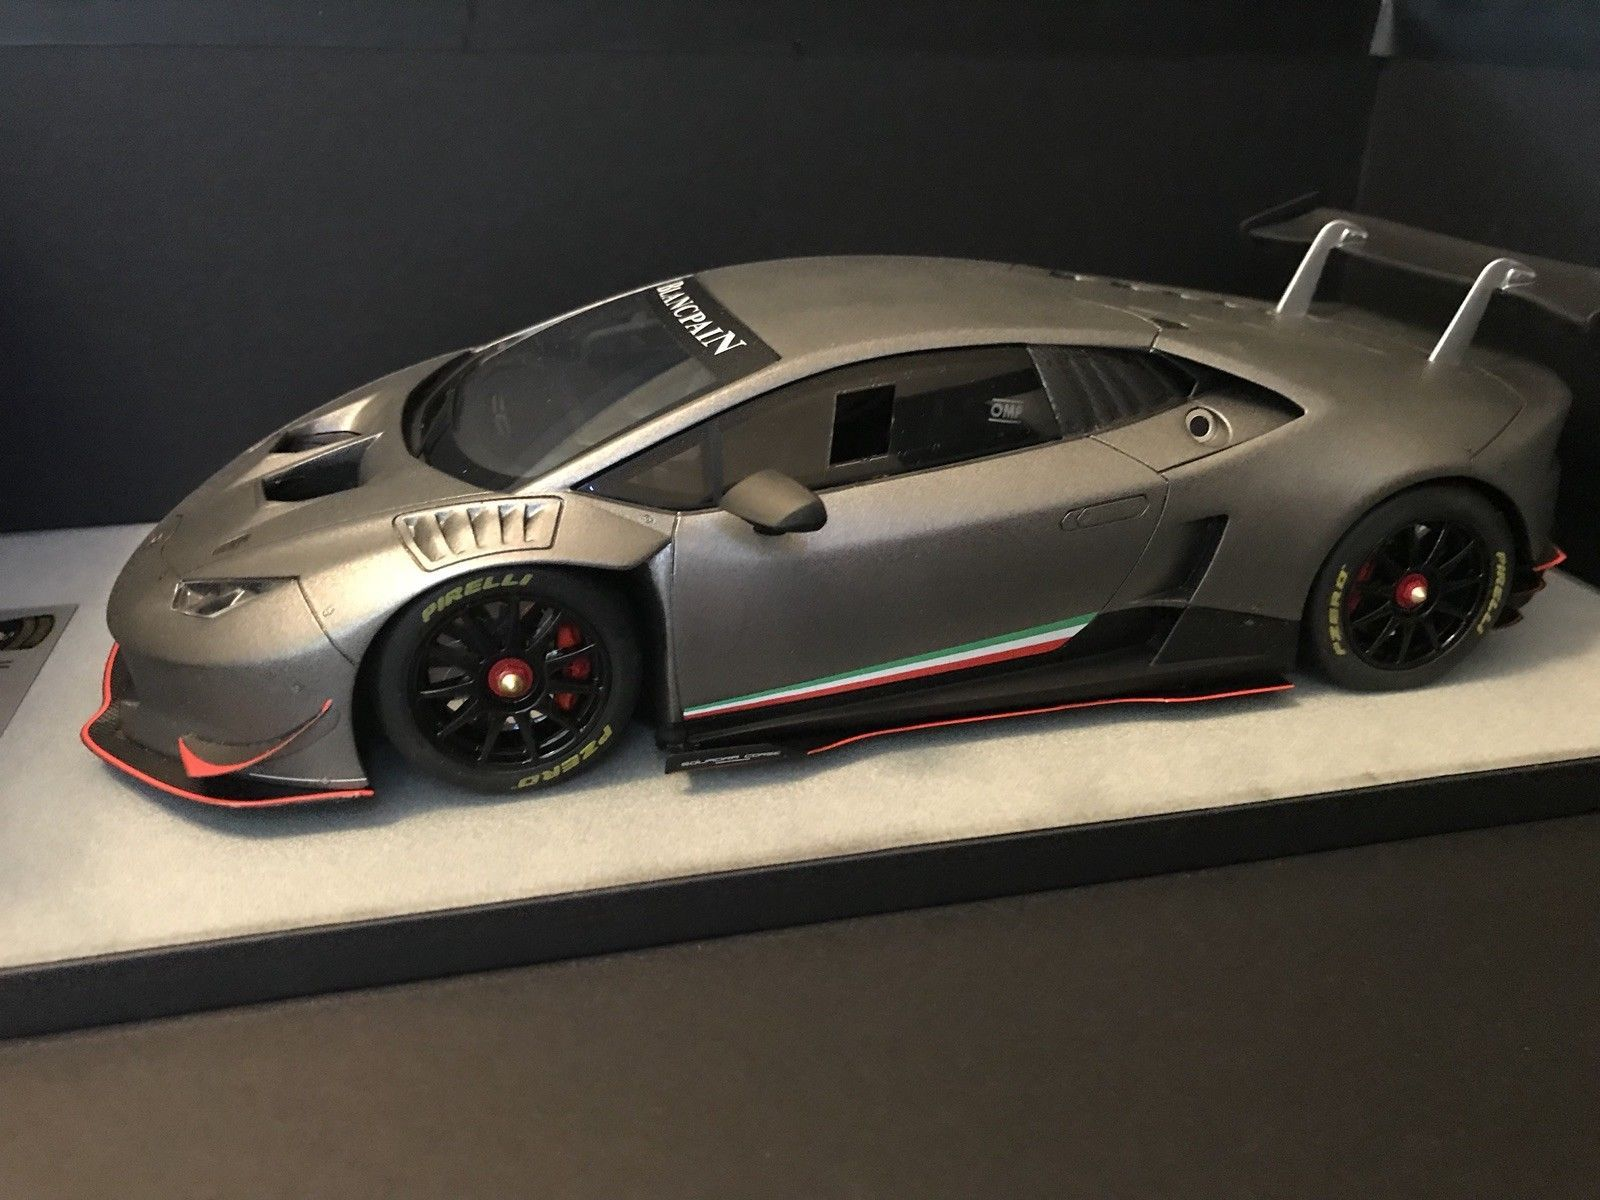 747b83ea37a9f898bad6fe4ec2b47cbc Gorgeous Lamborghini Huracan Lp620-2 Super Trofeo top Speed Cars Trend